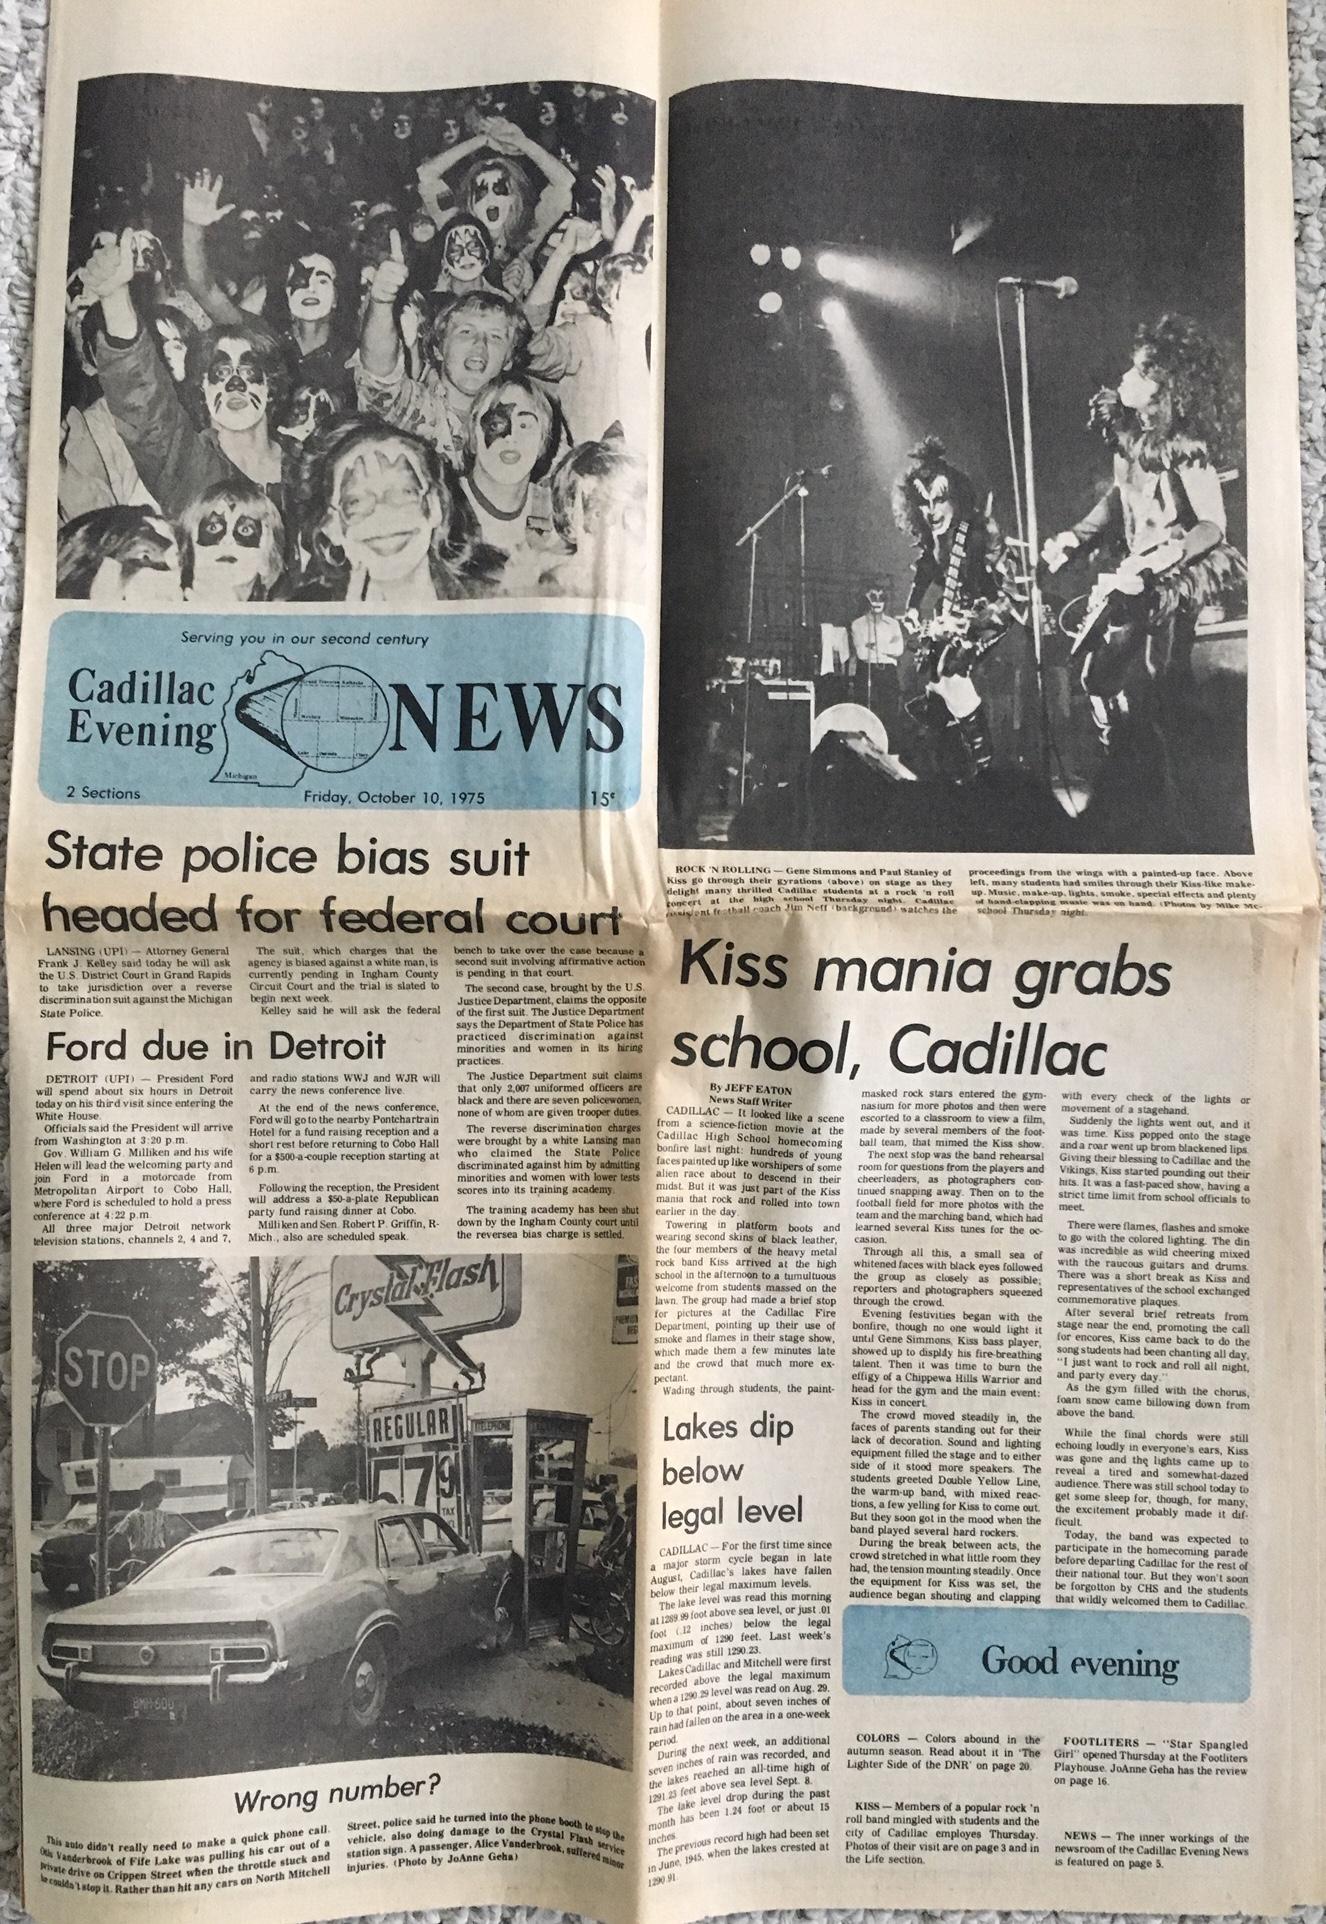 Cadillac Evening News >> Press Release Cadillac Kiss By Jim Neff